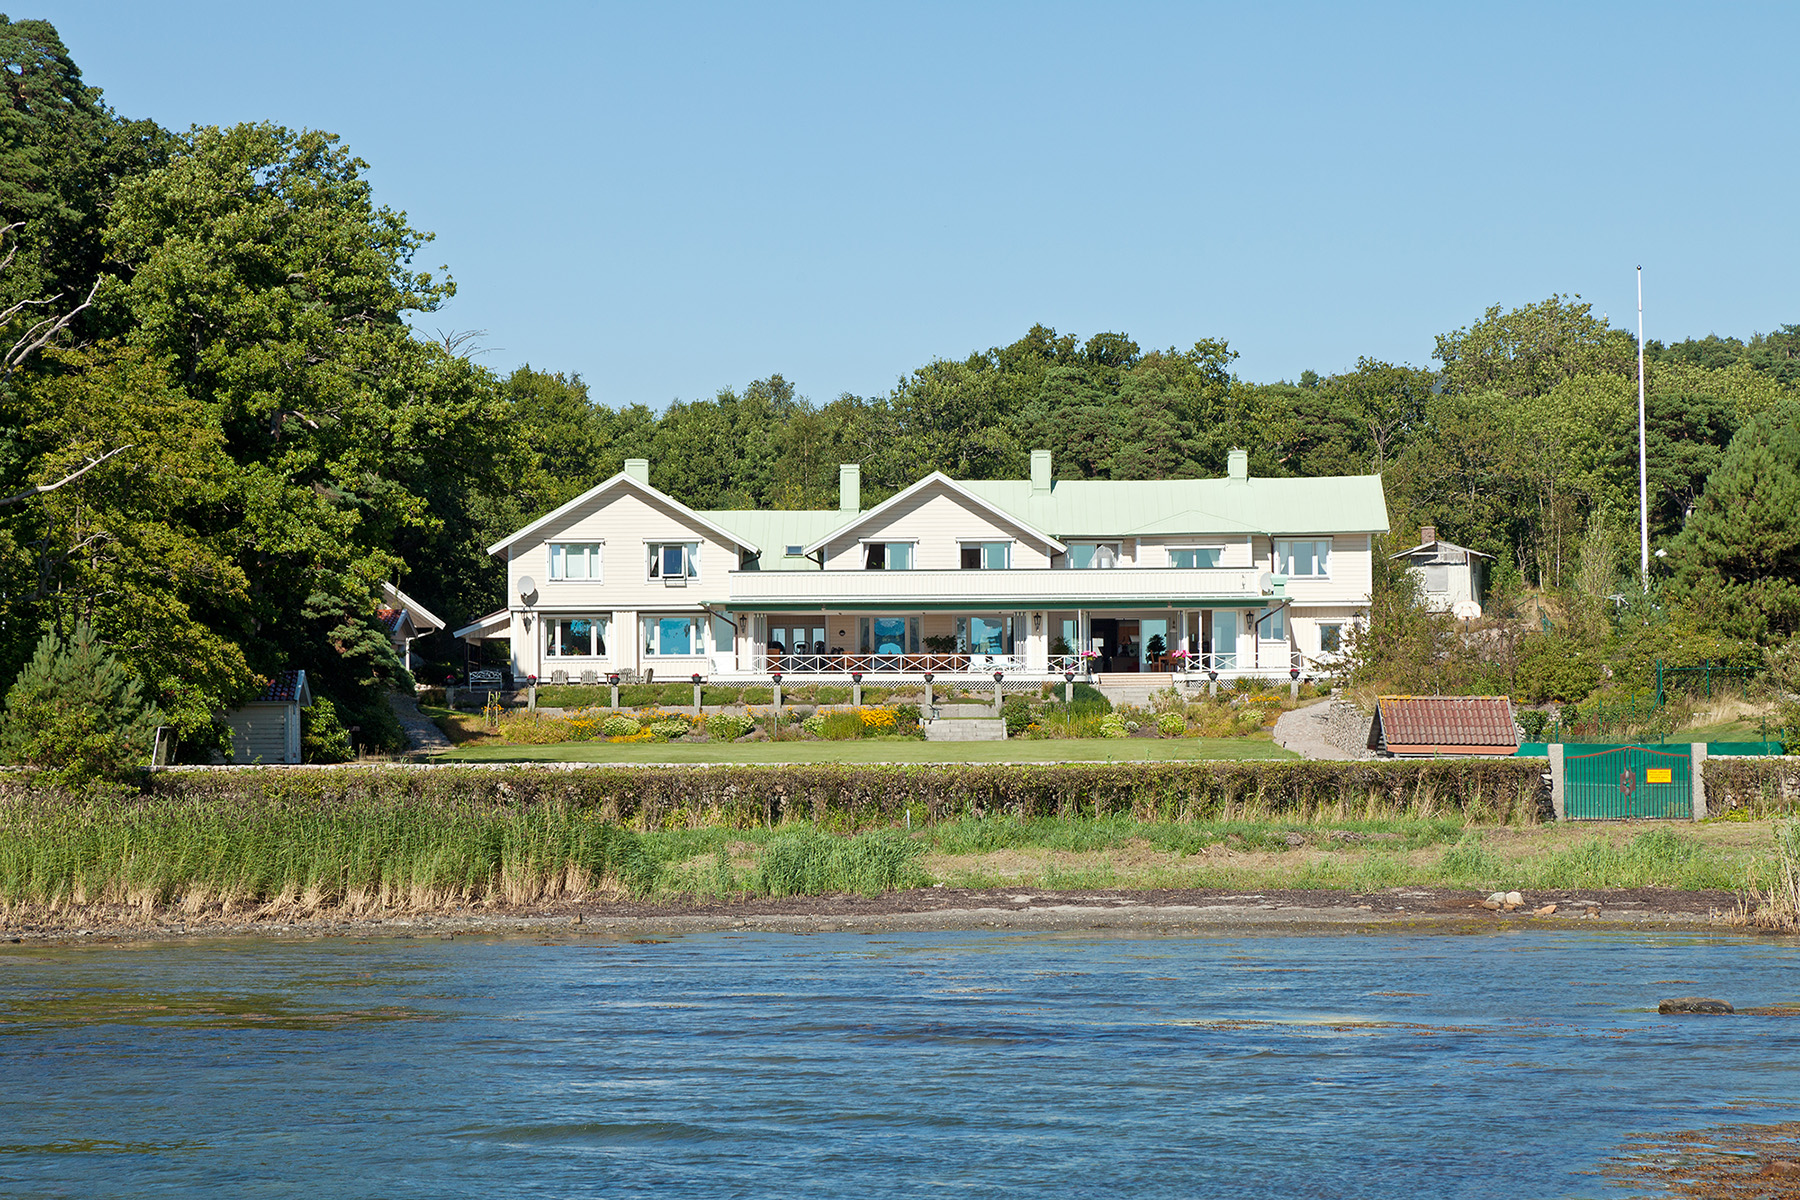 Single Family Home for Sale at Historic property next to the ocean Gustaf V:s Vag 11 Other Vastra Gotaland, Vastra Gotaland, 42943 Sweden